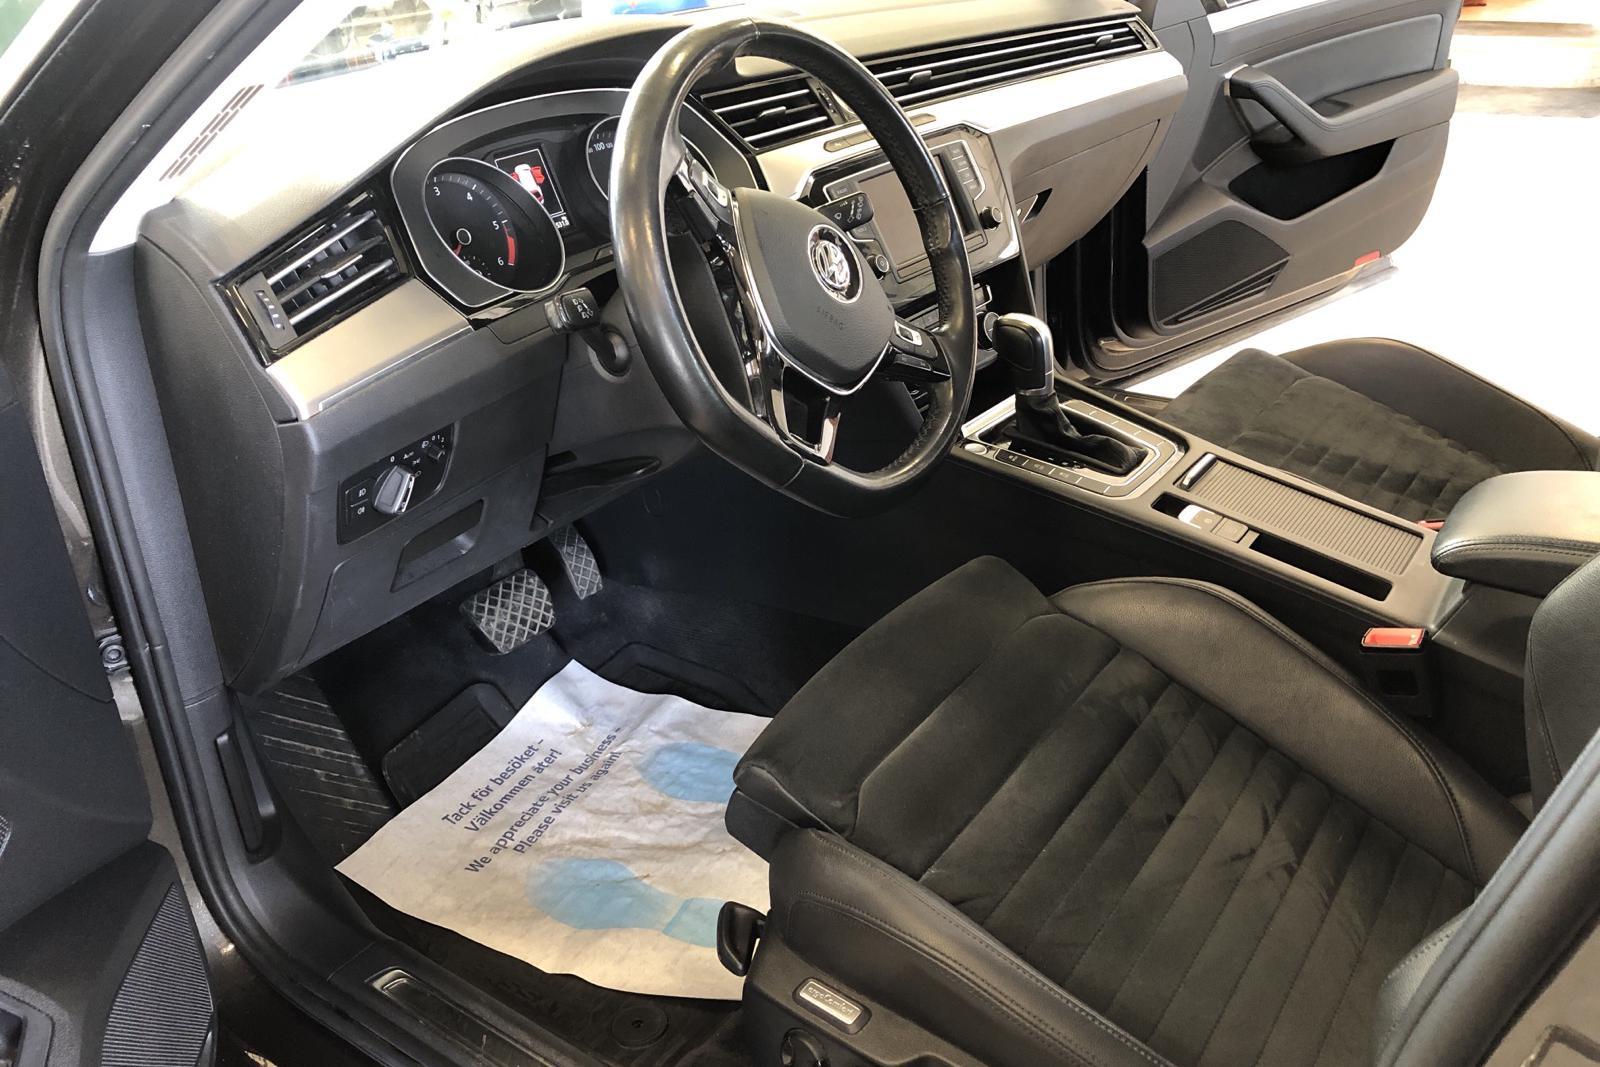 VW Passat 2.0 TDI Sportscombi (190hk) - 7 822 mil - Automat - brun - 2015